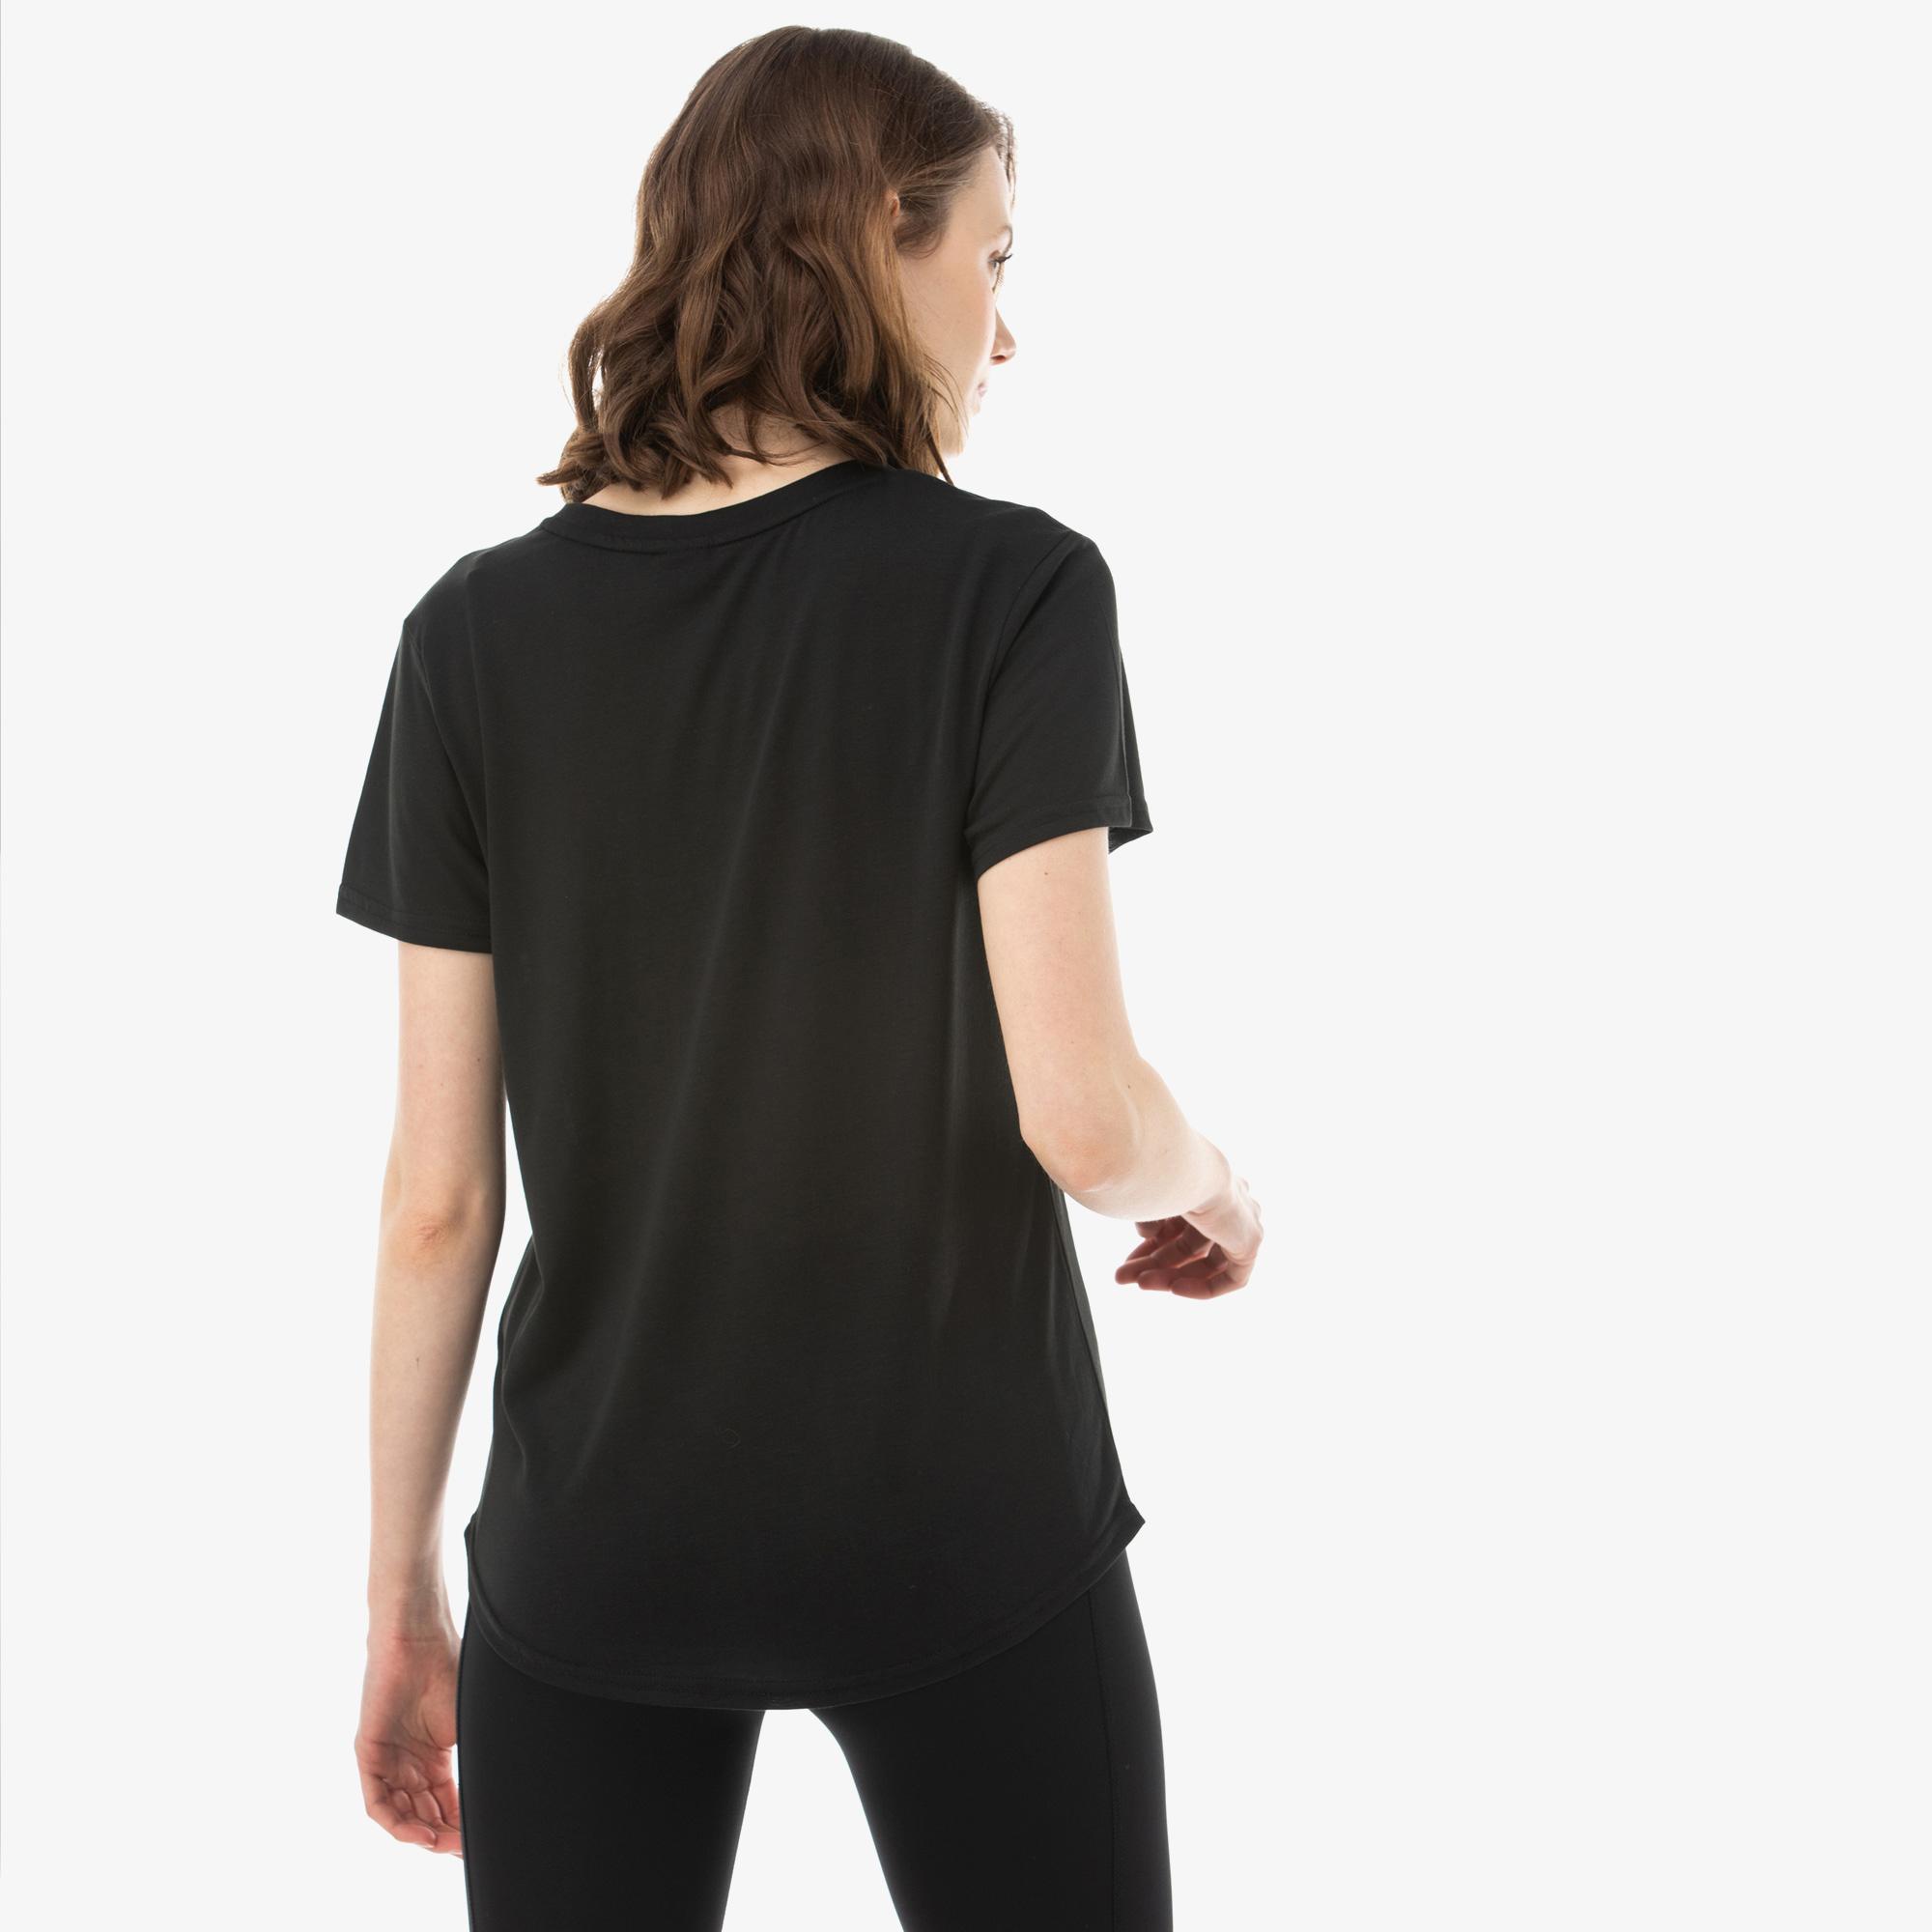 Puma Evostripe Kadın Siyah T-Shirt